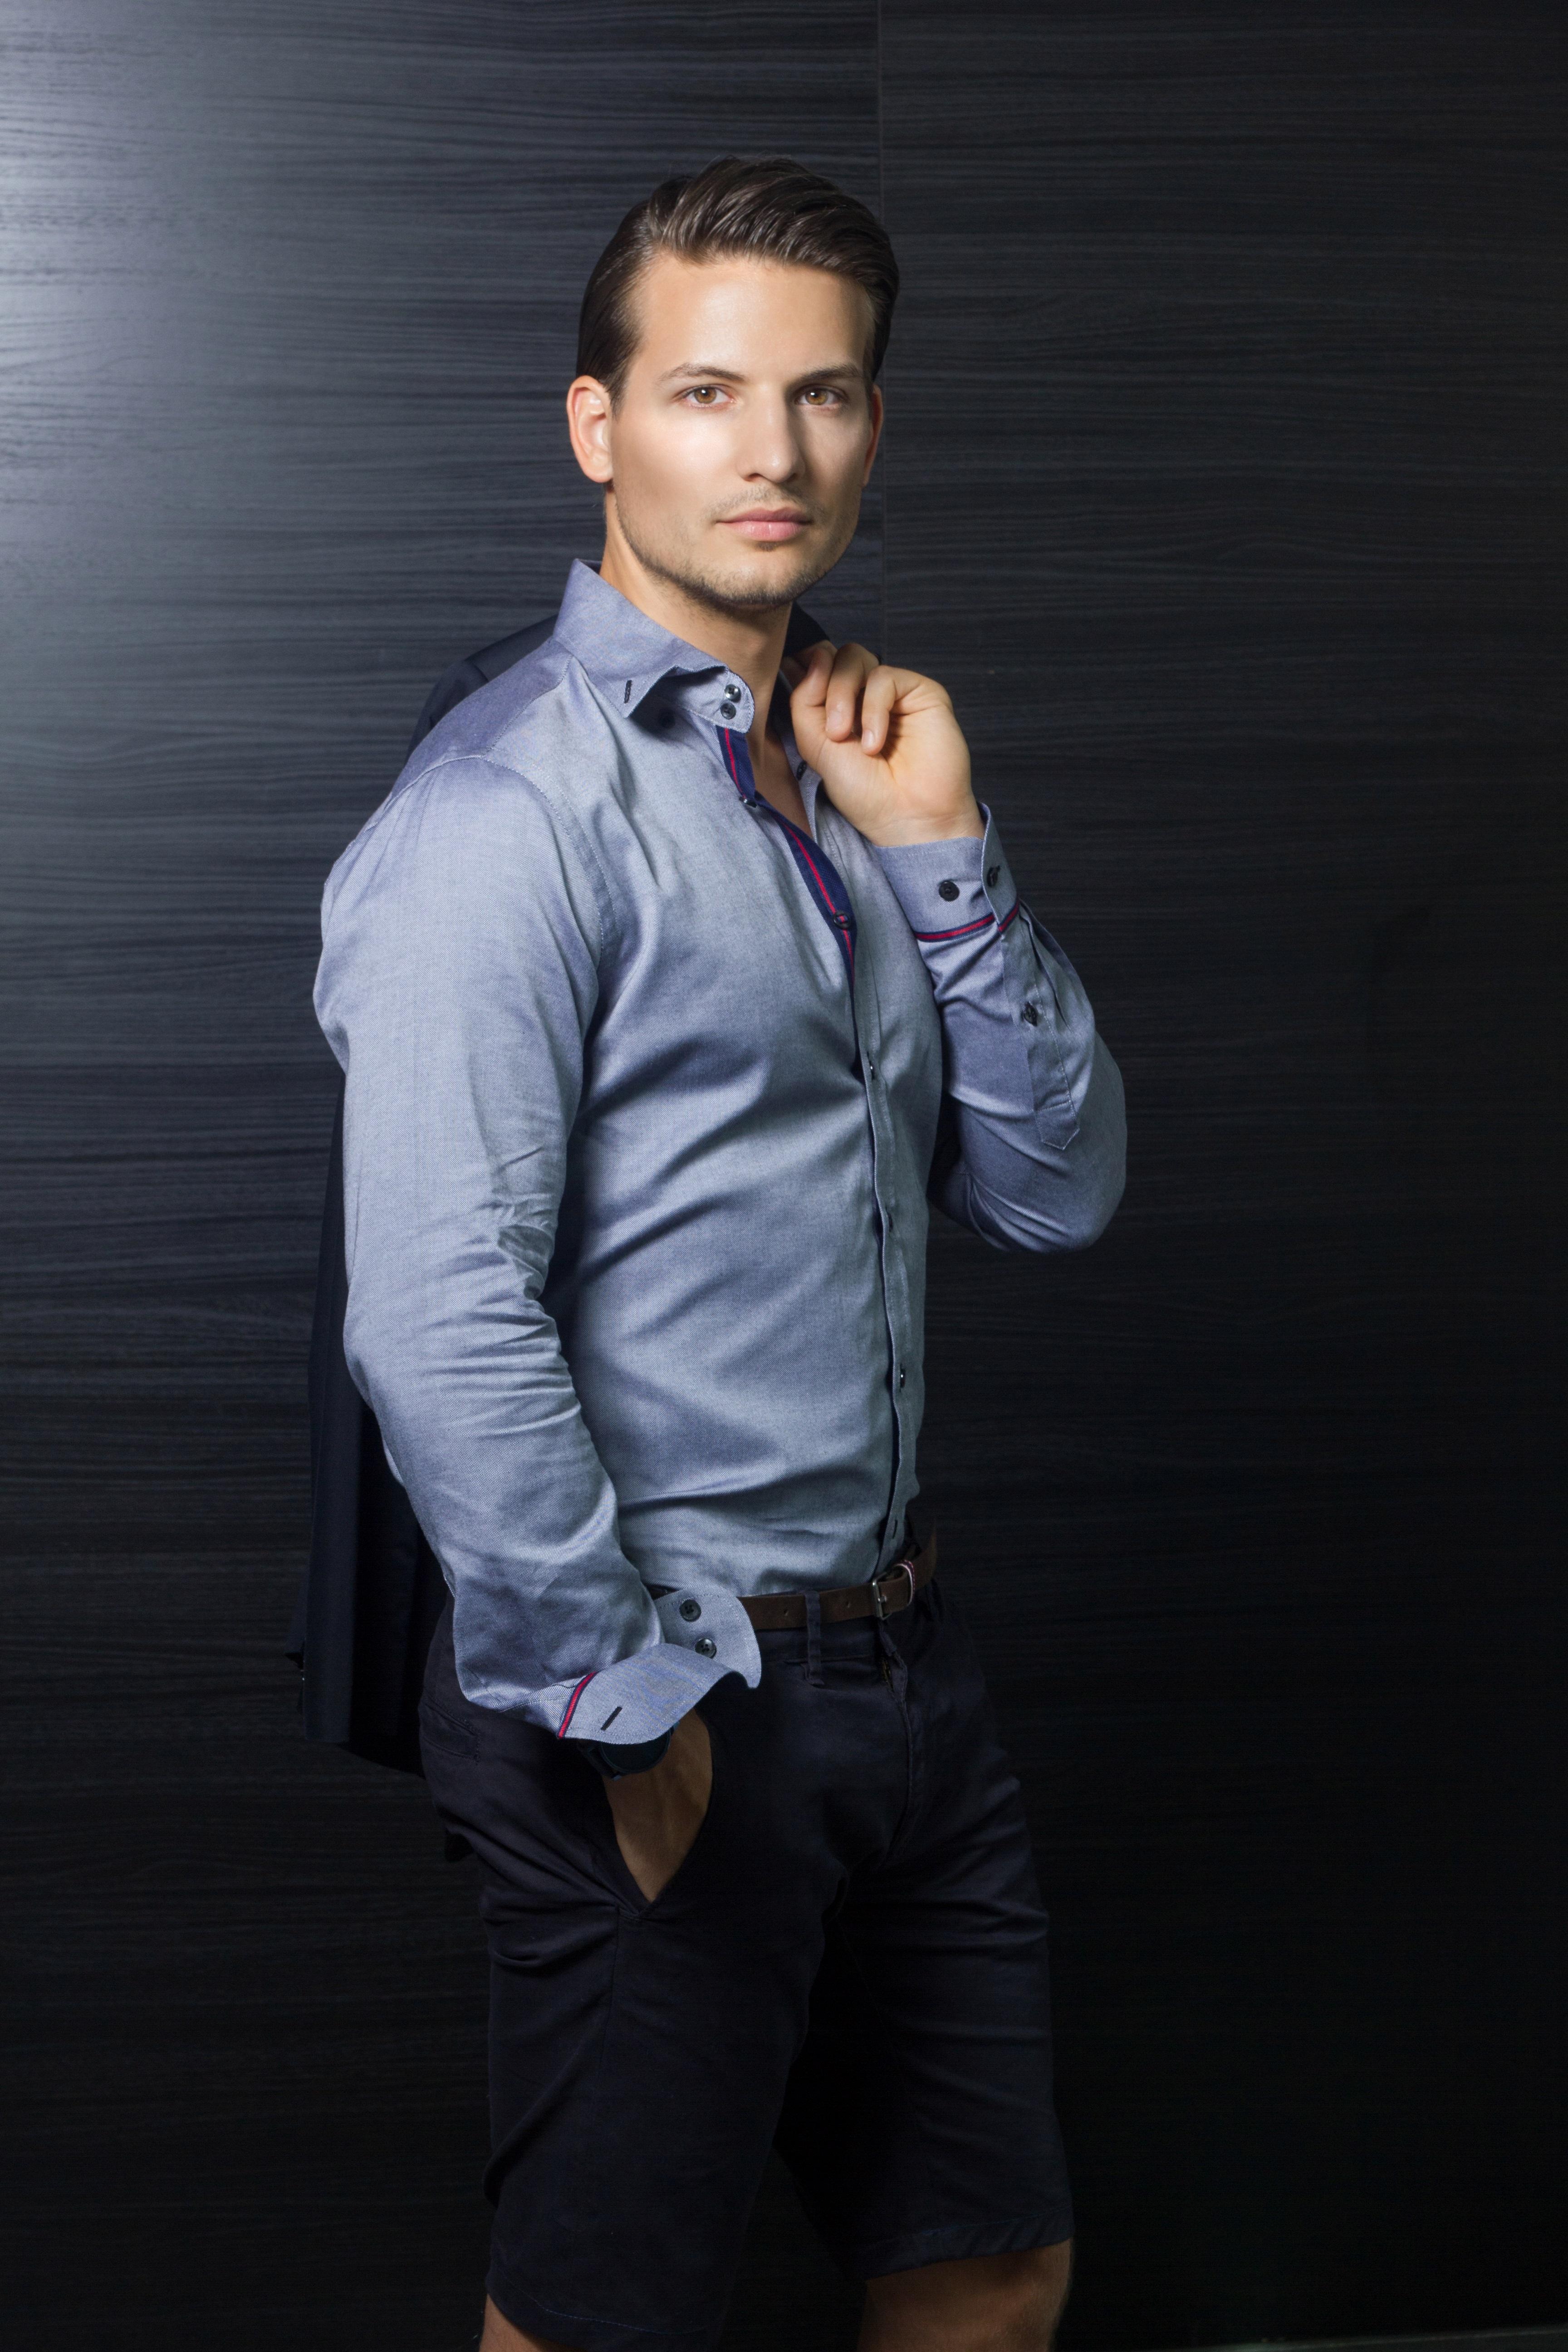 daniel nyiri fashion model personal trainer entrepreneur owner of 4u fitness emsworkout